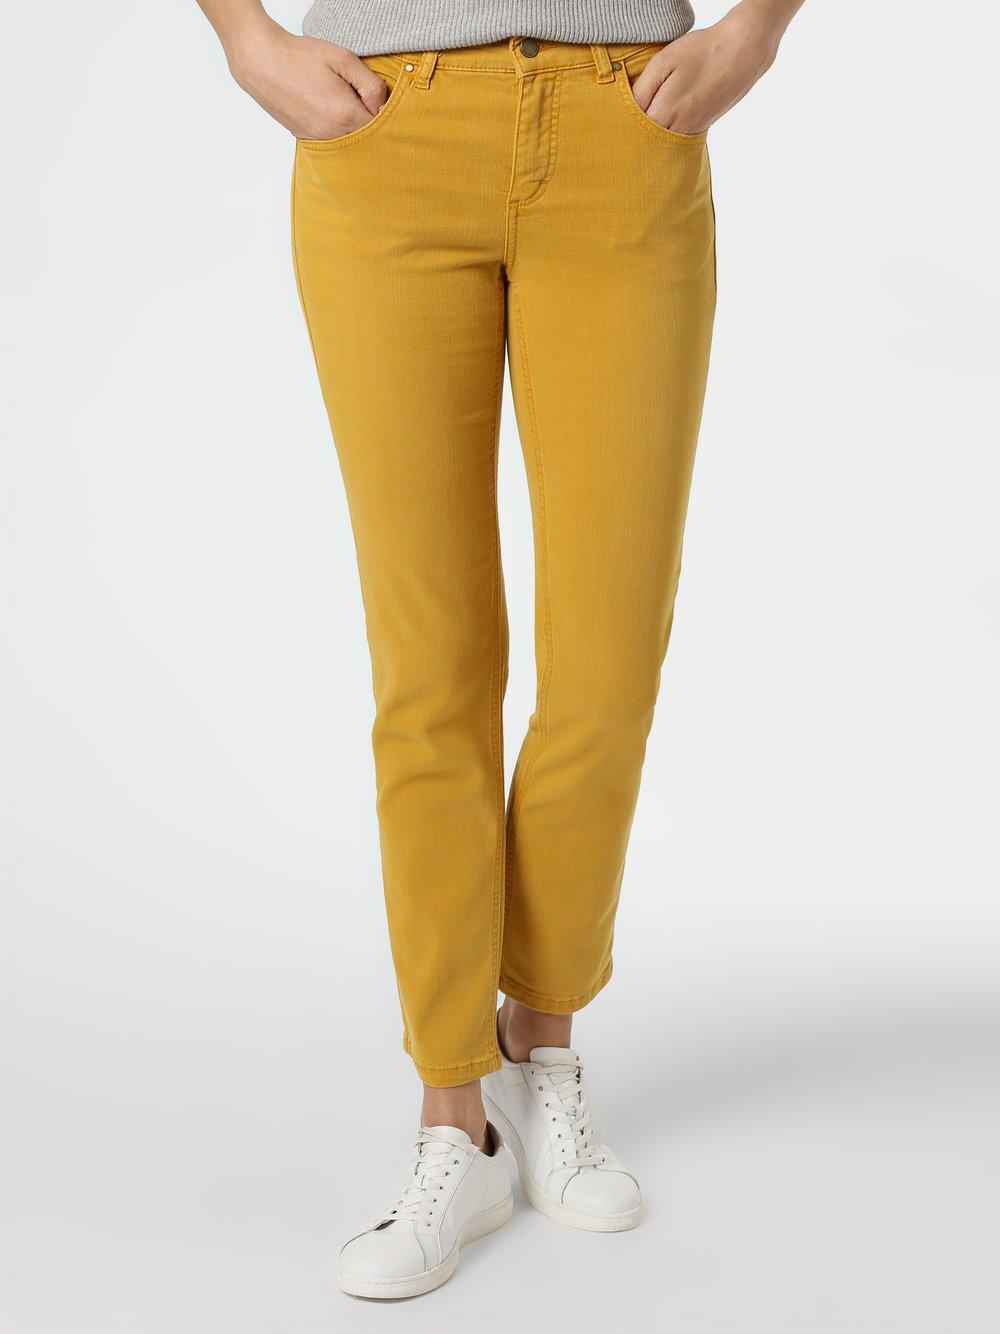 Angels – Jeansy damskie – Cici, żółty Van Graaf 448206-0001